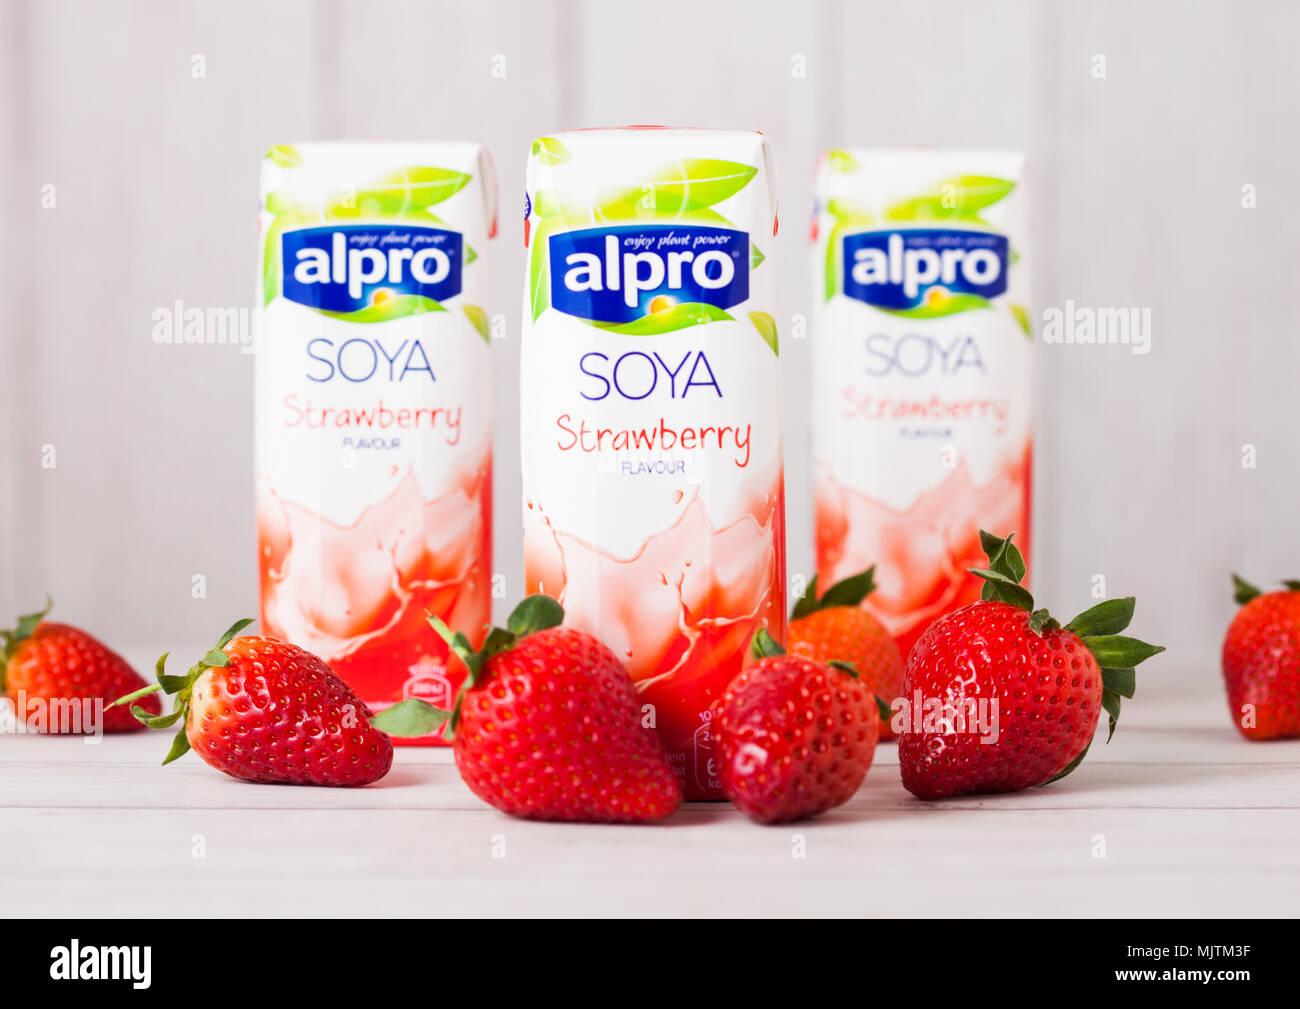 Soya Milk Alpro Stock Photos Soya Milk Alpro Stock Images